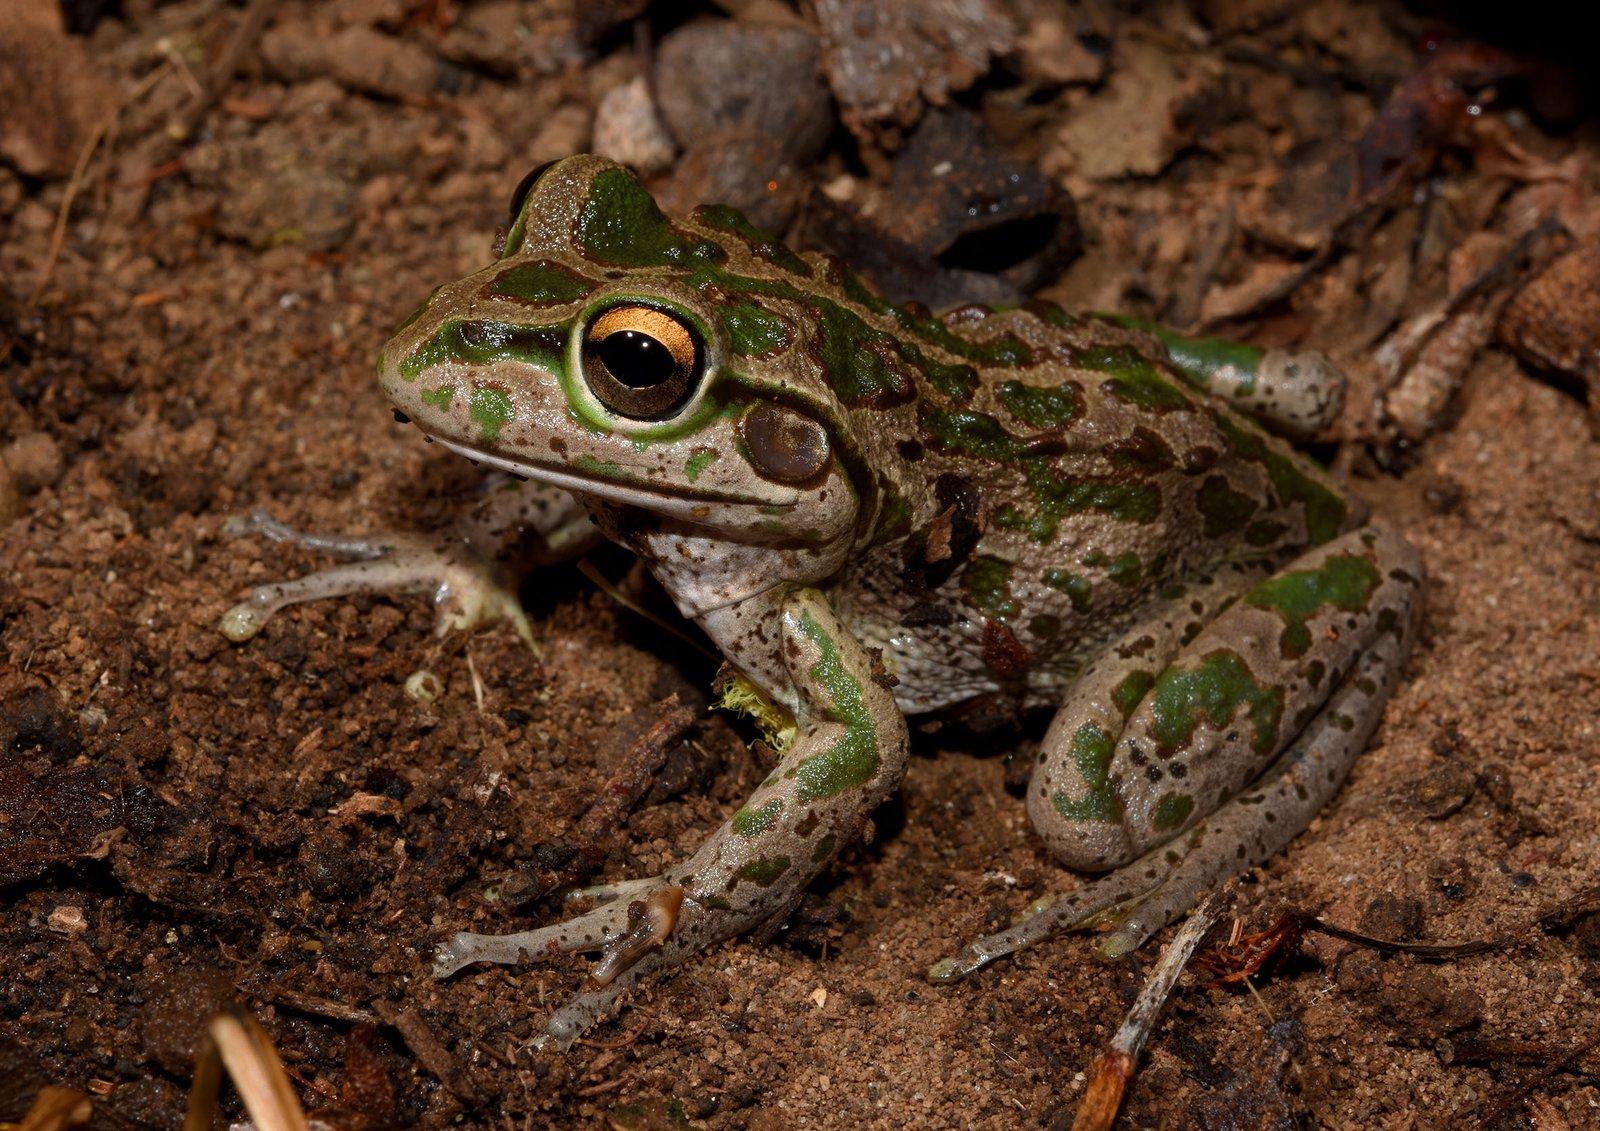 Motorbike frog (Litoria moorei). [Photographer: Jodi Rowley. Copyright: Jodi Rowley]